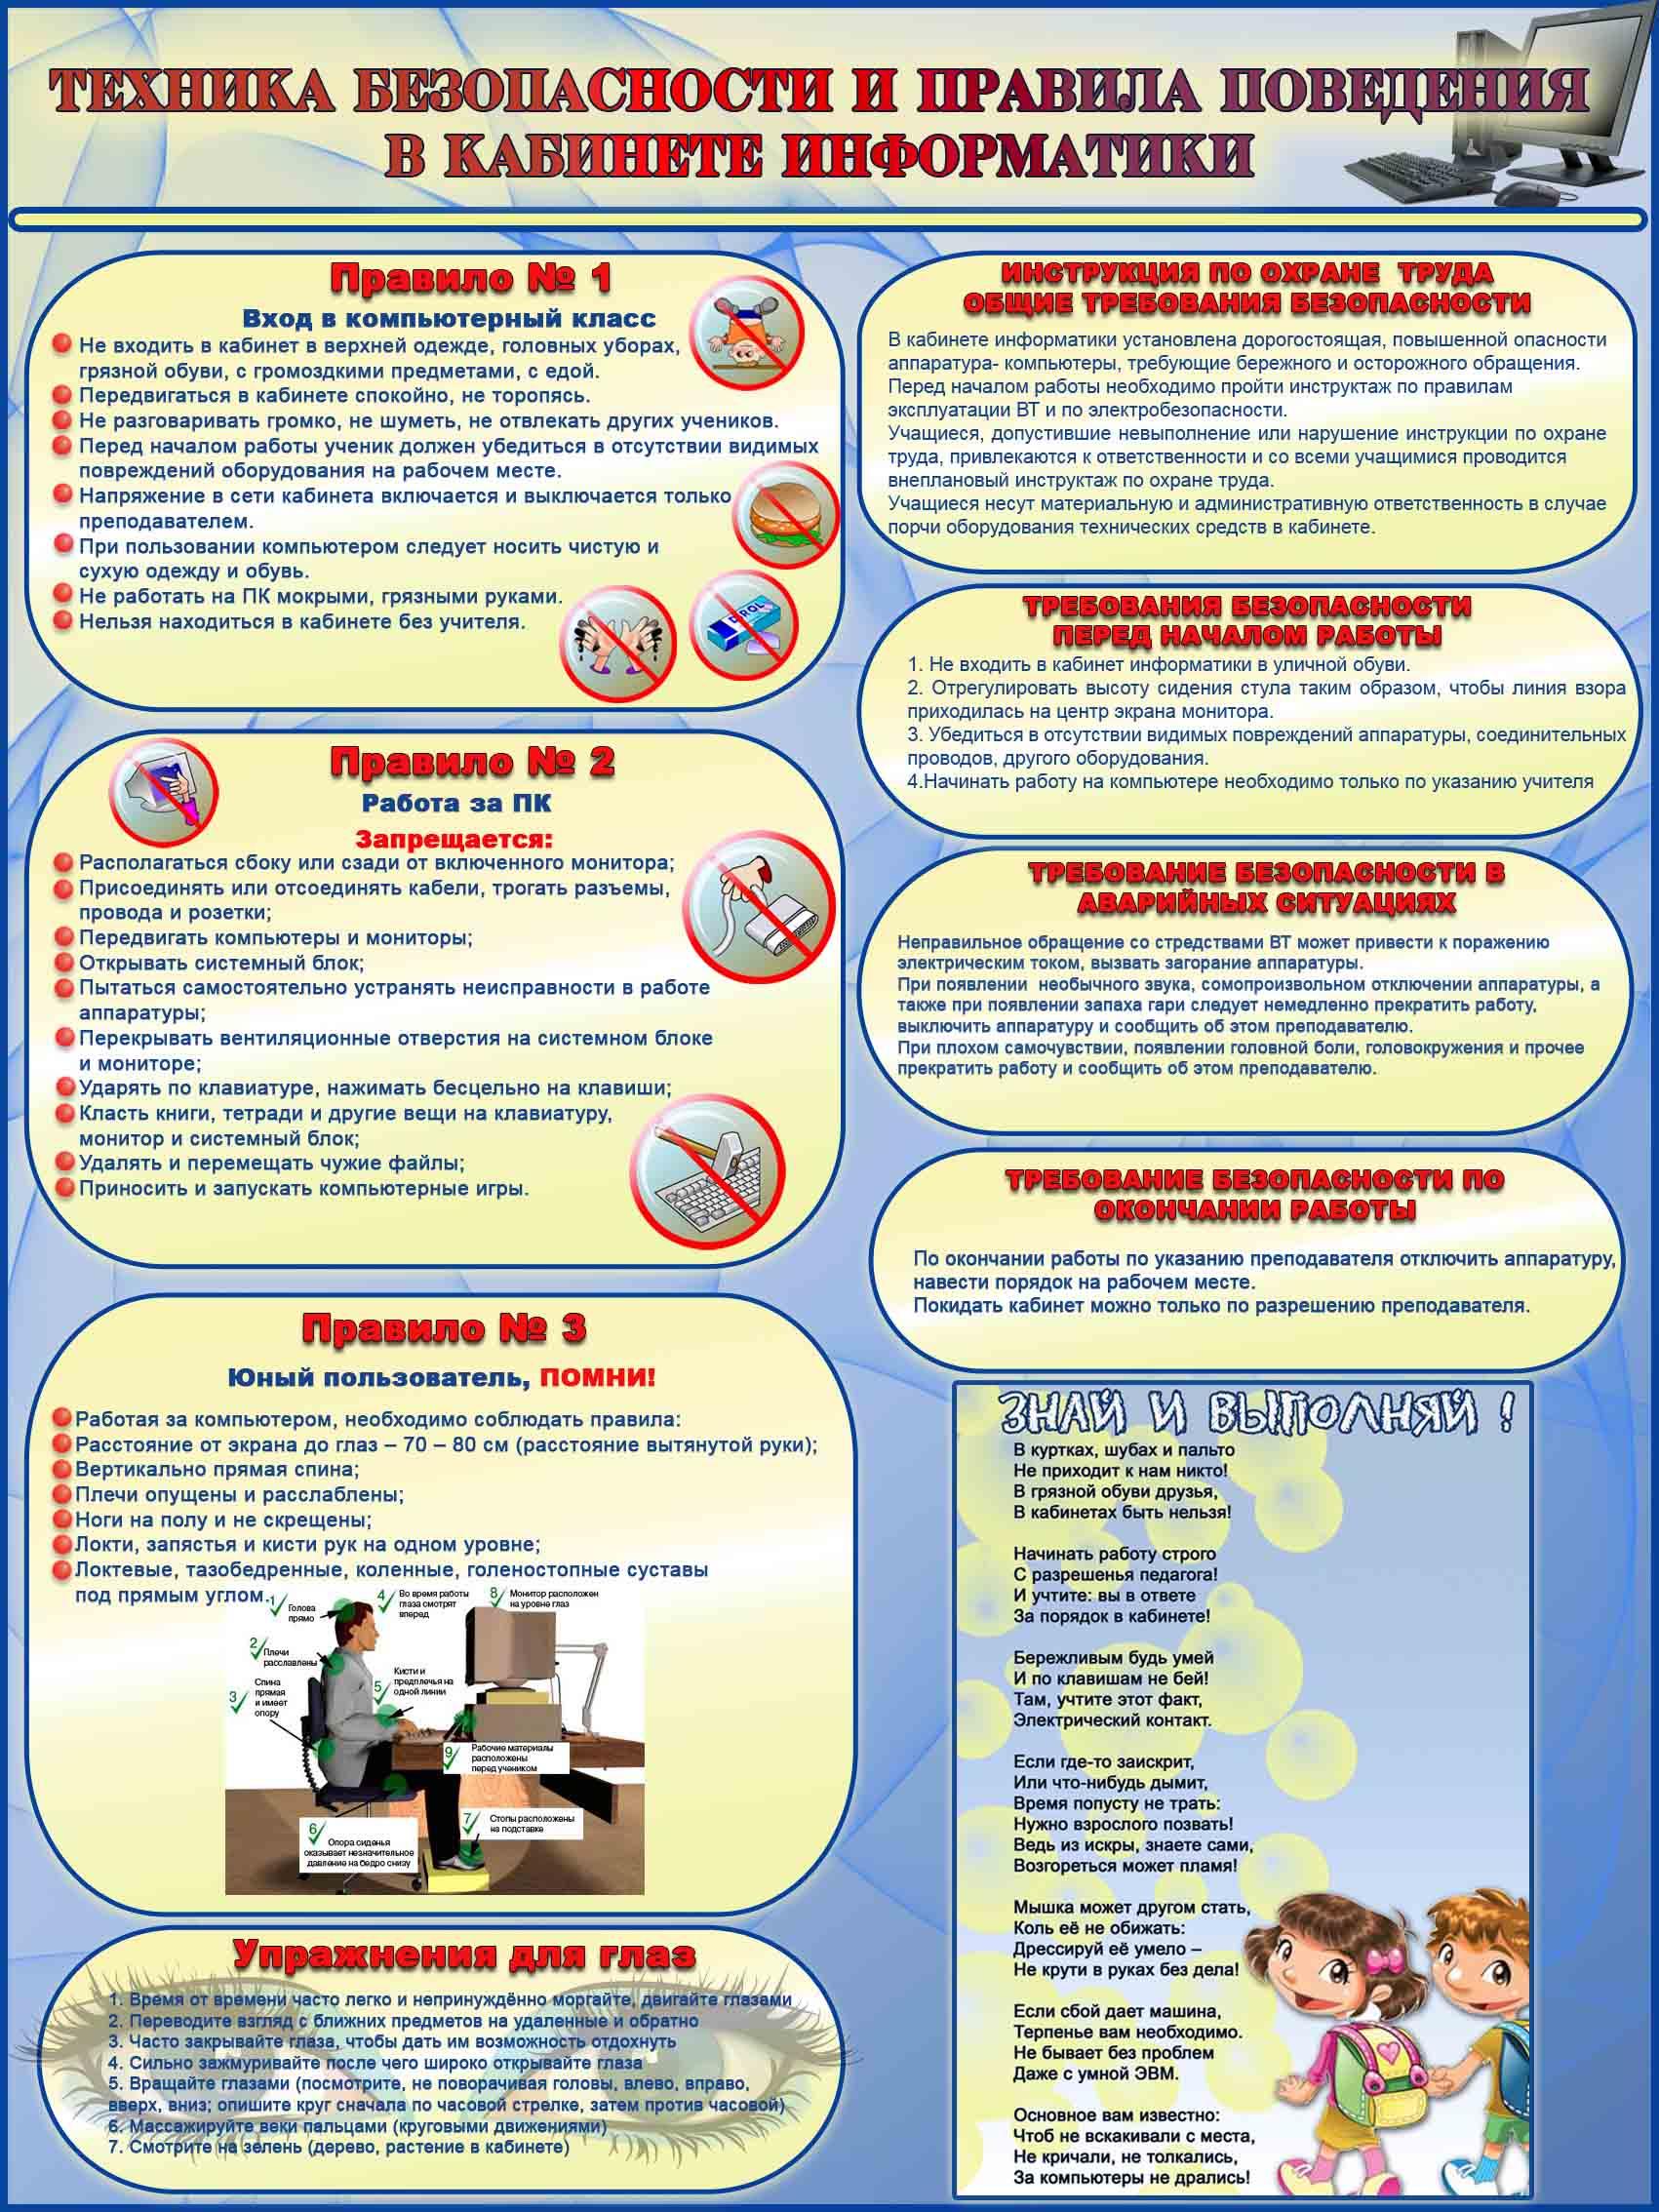 Инструкция По Охране Труда При Работе На Гильотине